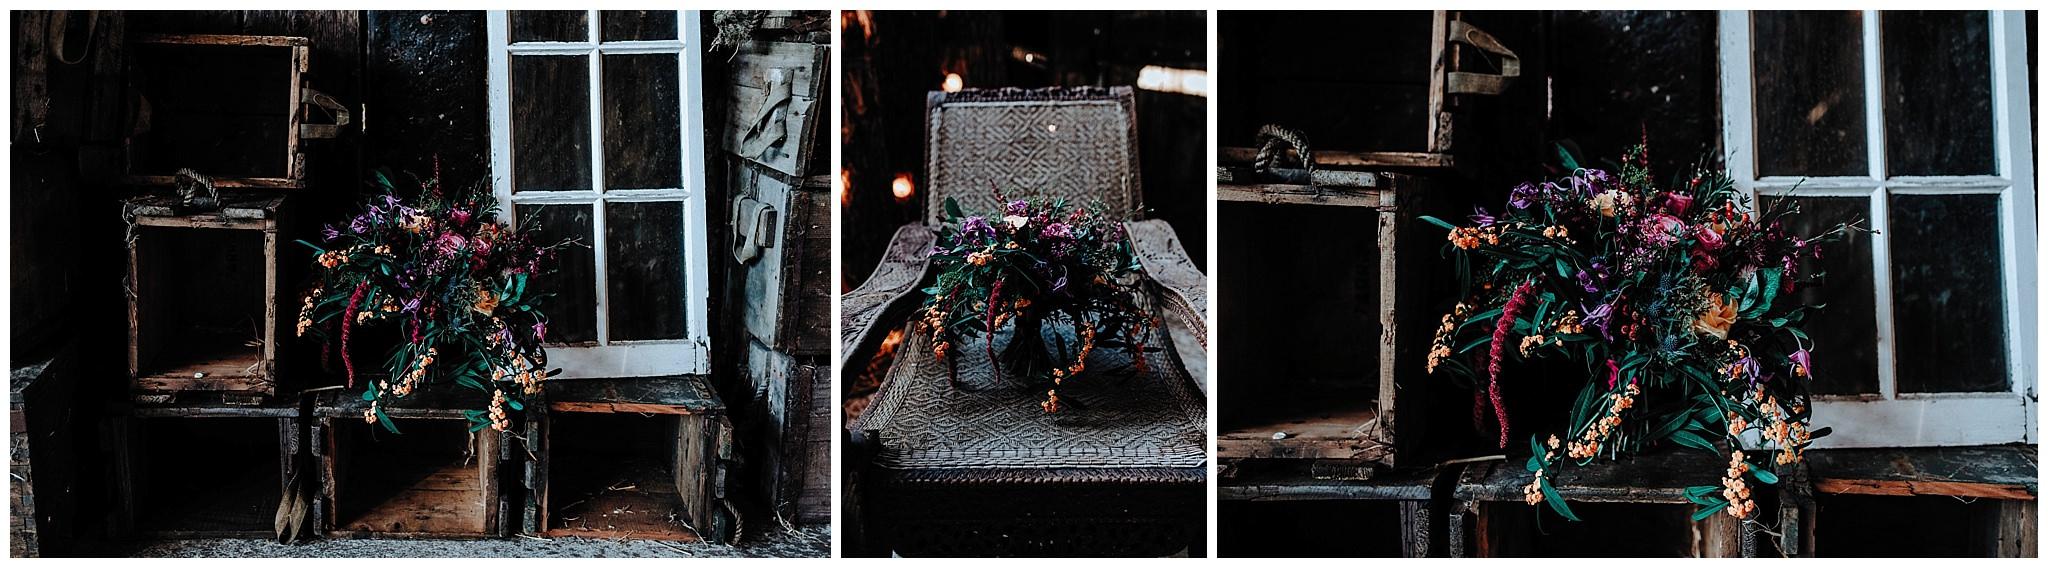 Owen-House-Wedding-Barn-Photography-51